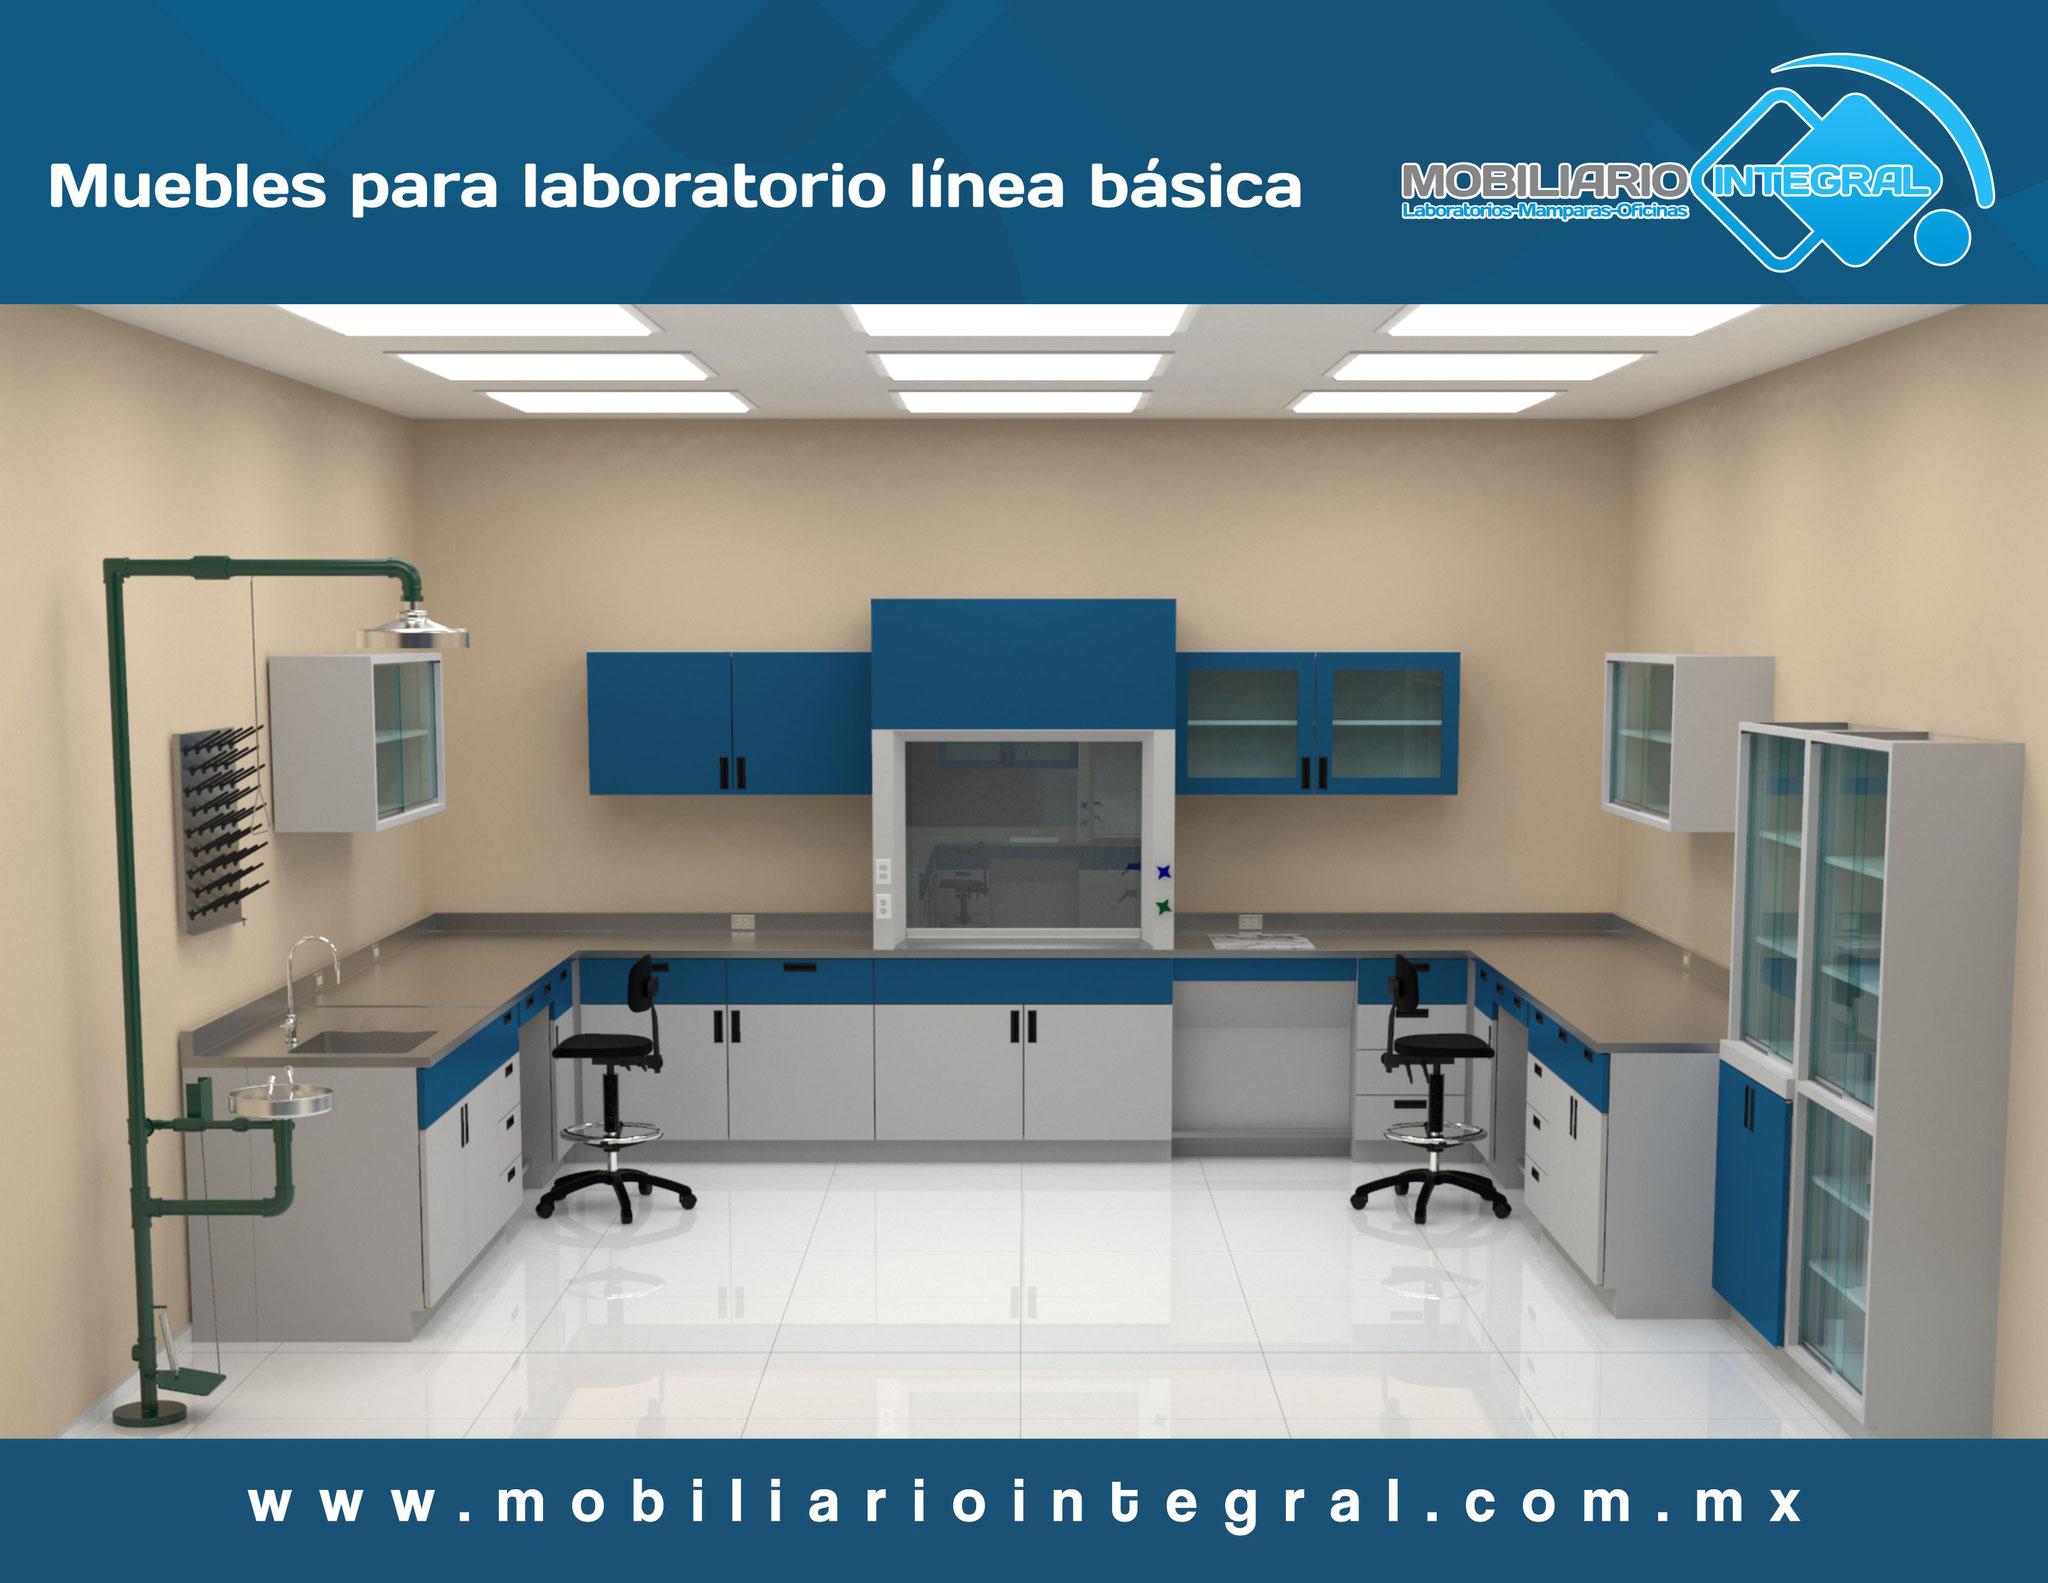 Muebles para laboratorio en Navojoa